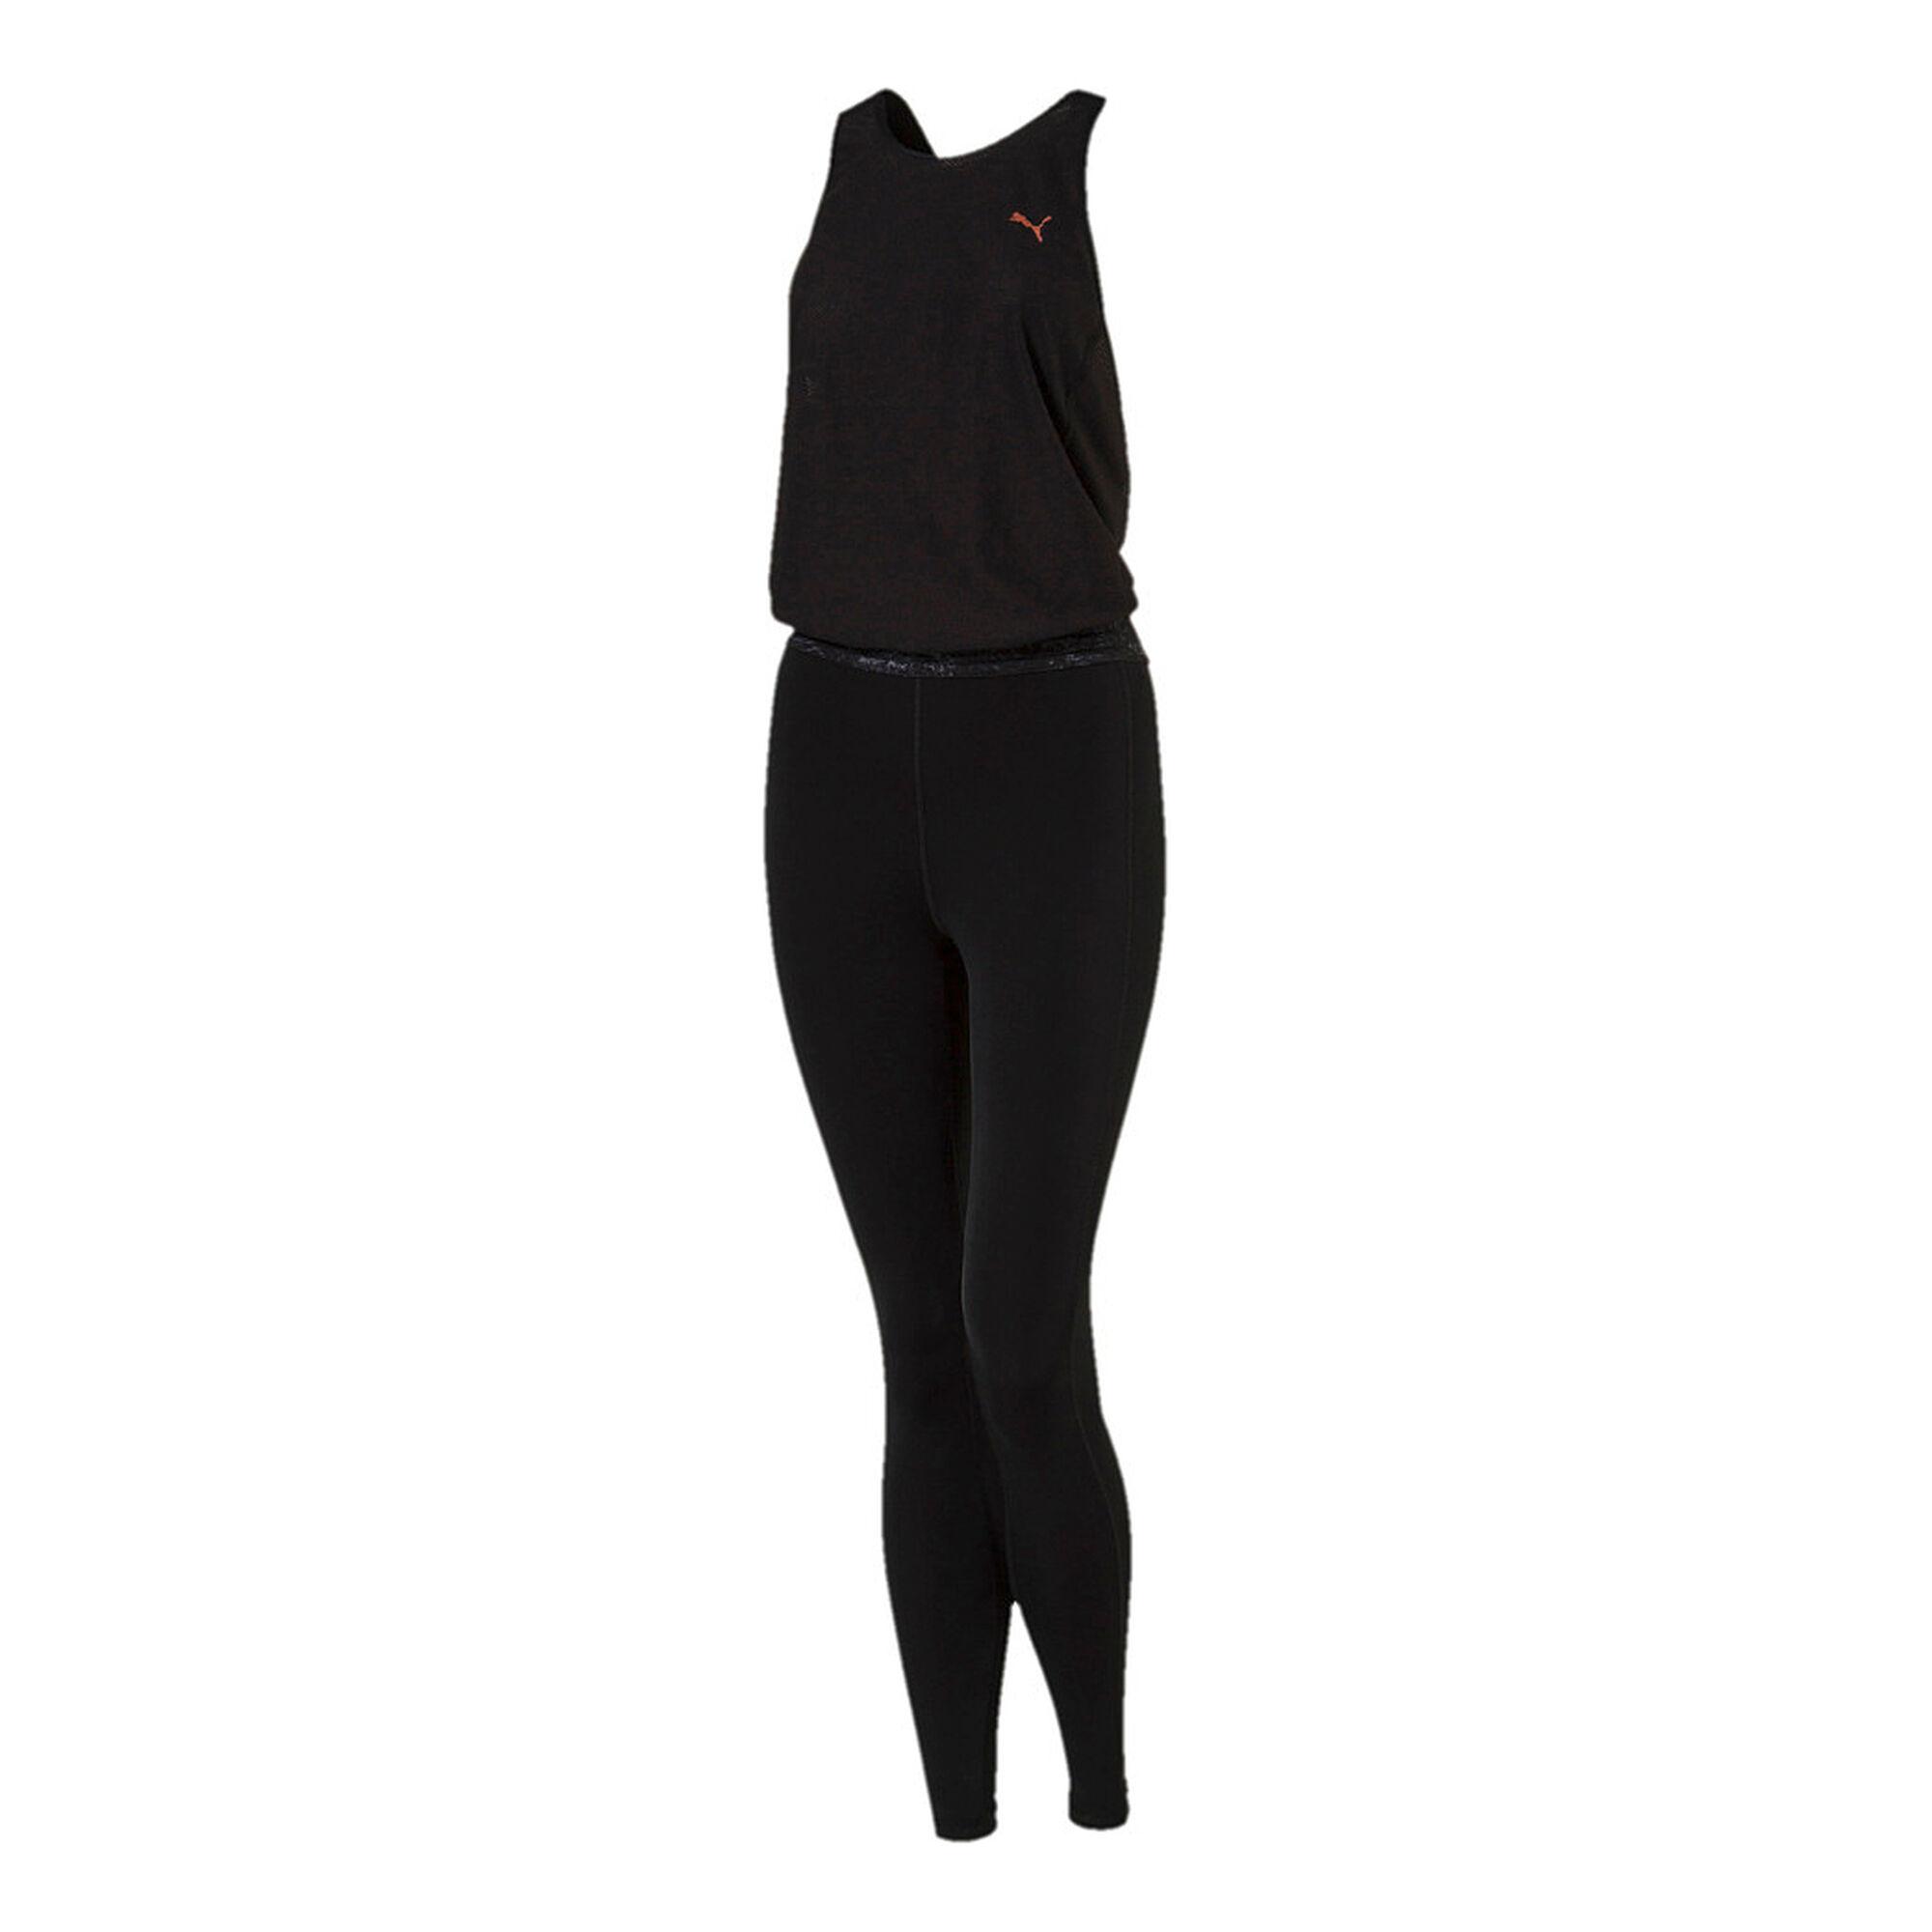 df03e18b51 buy Puma Explosive Bodysuit Tight Women - Black